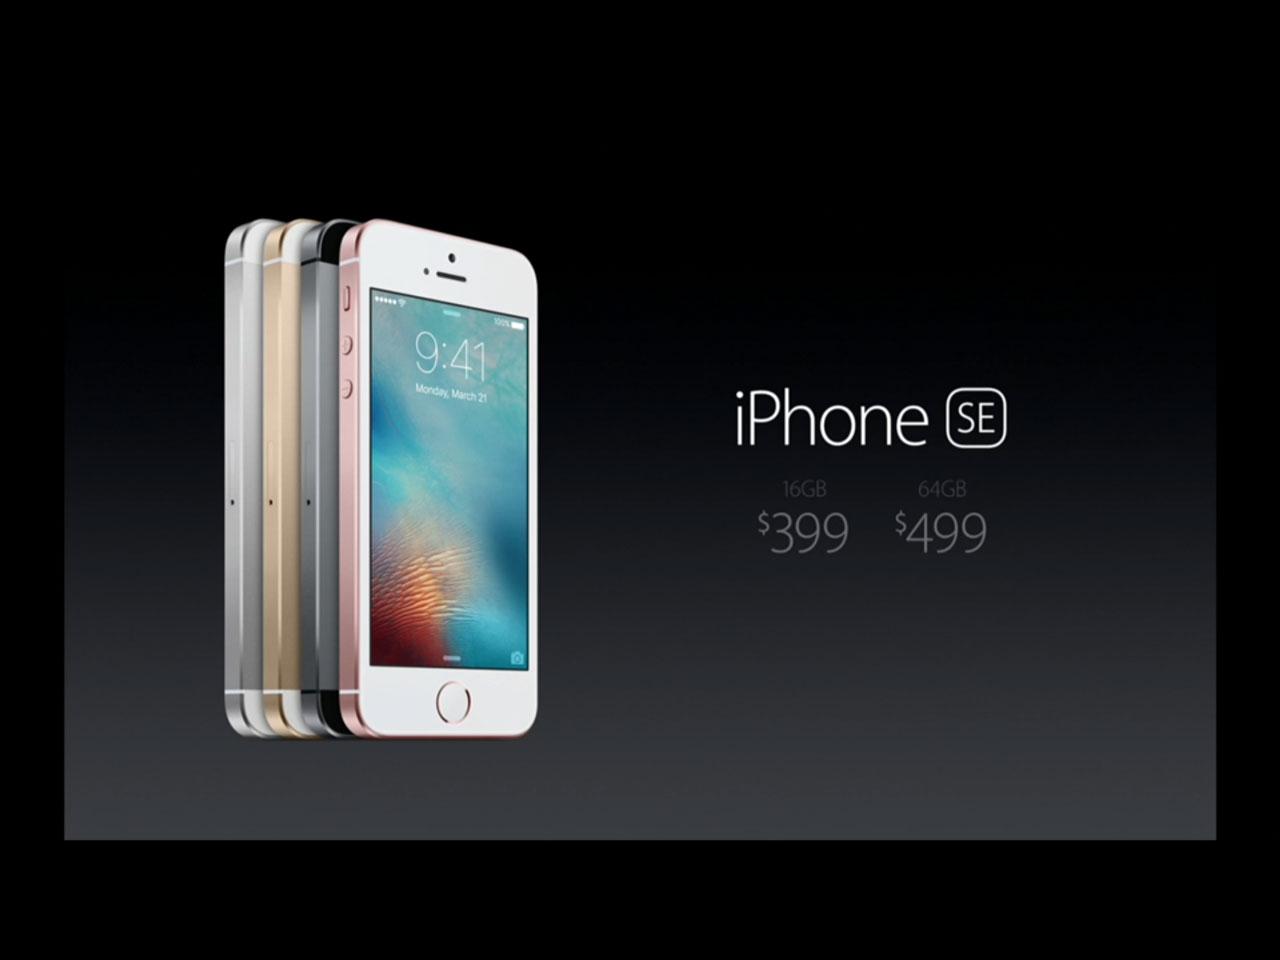 iphone-se-price